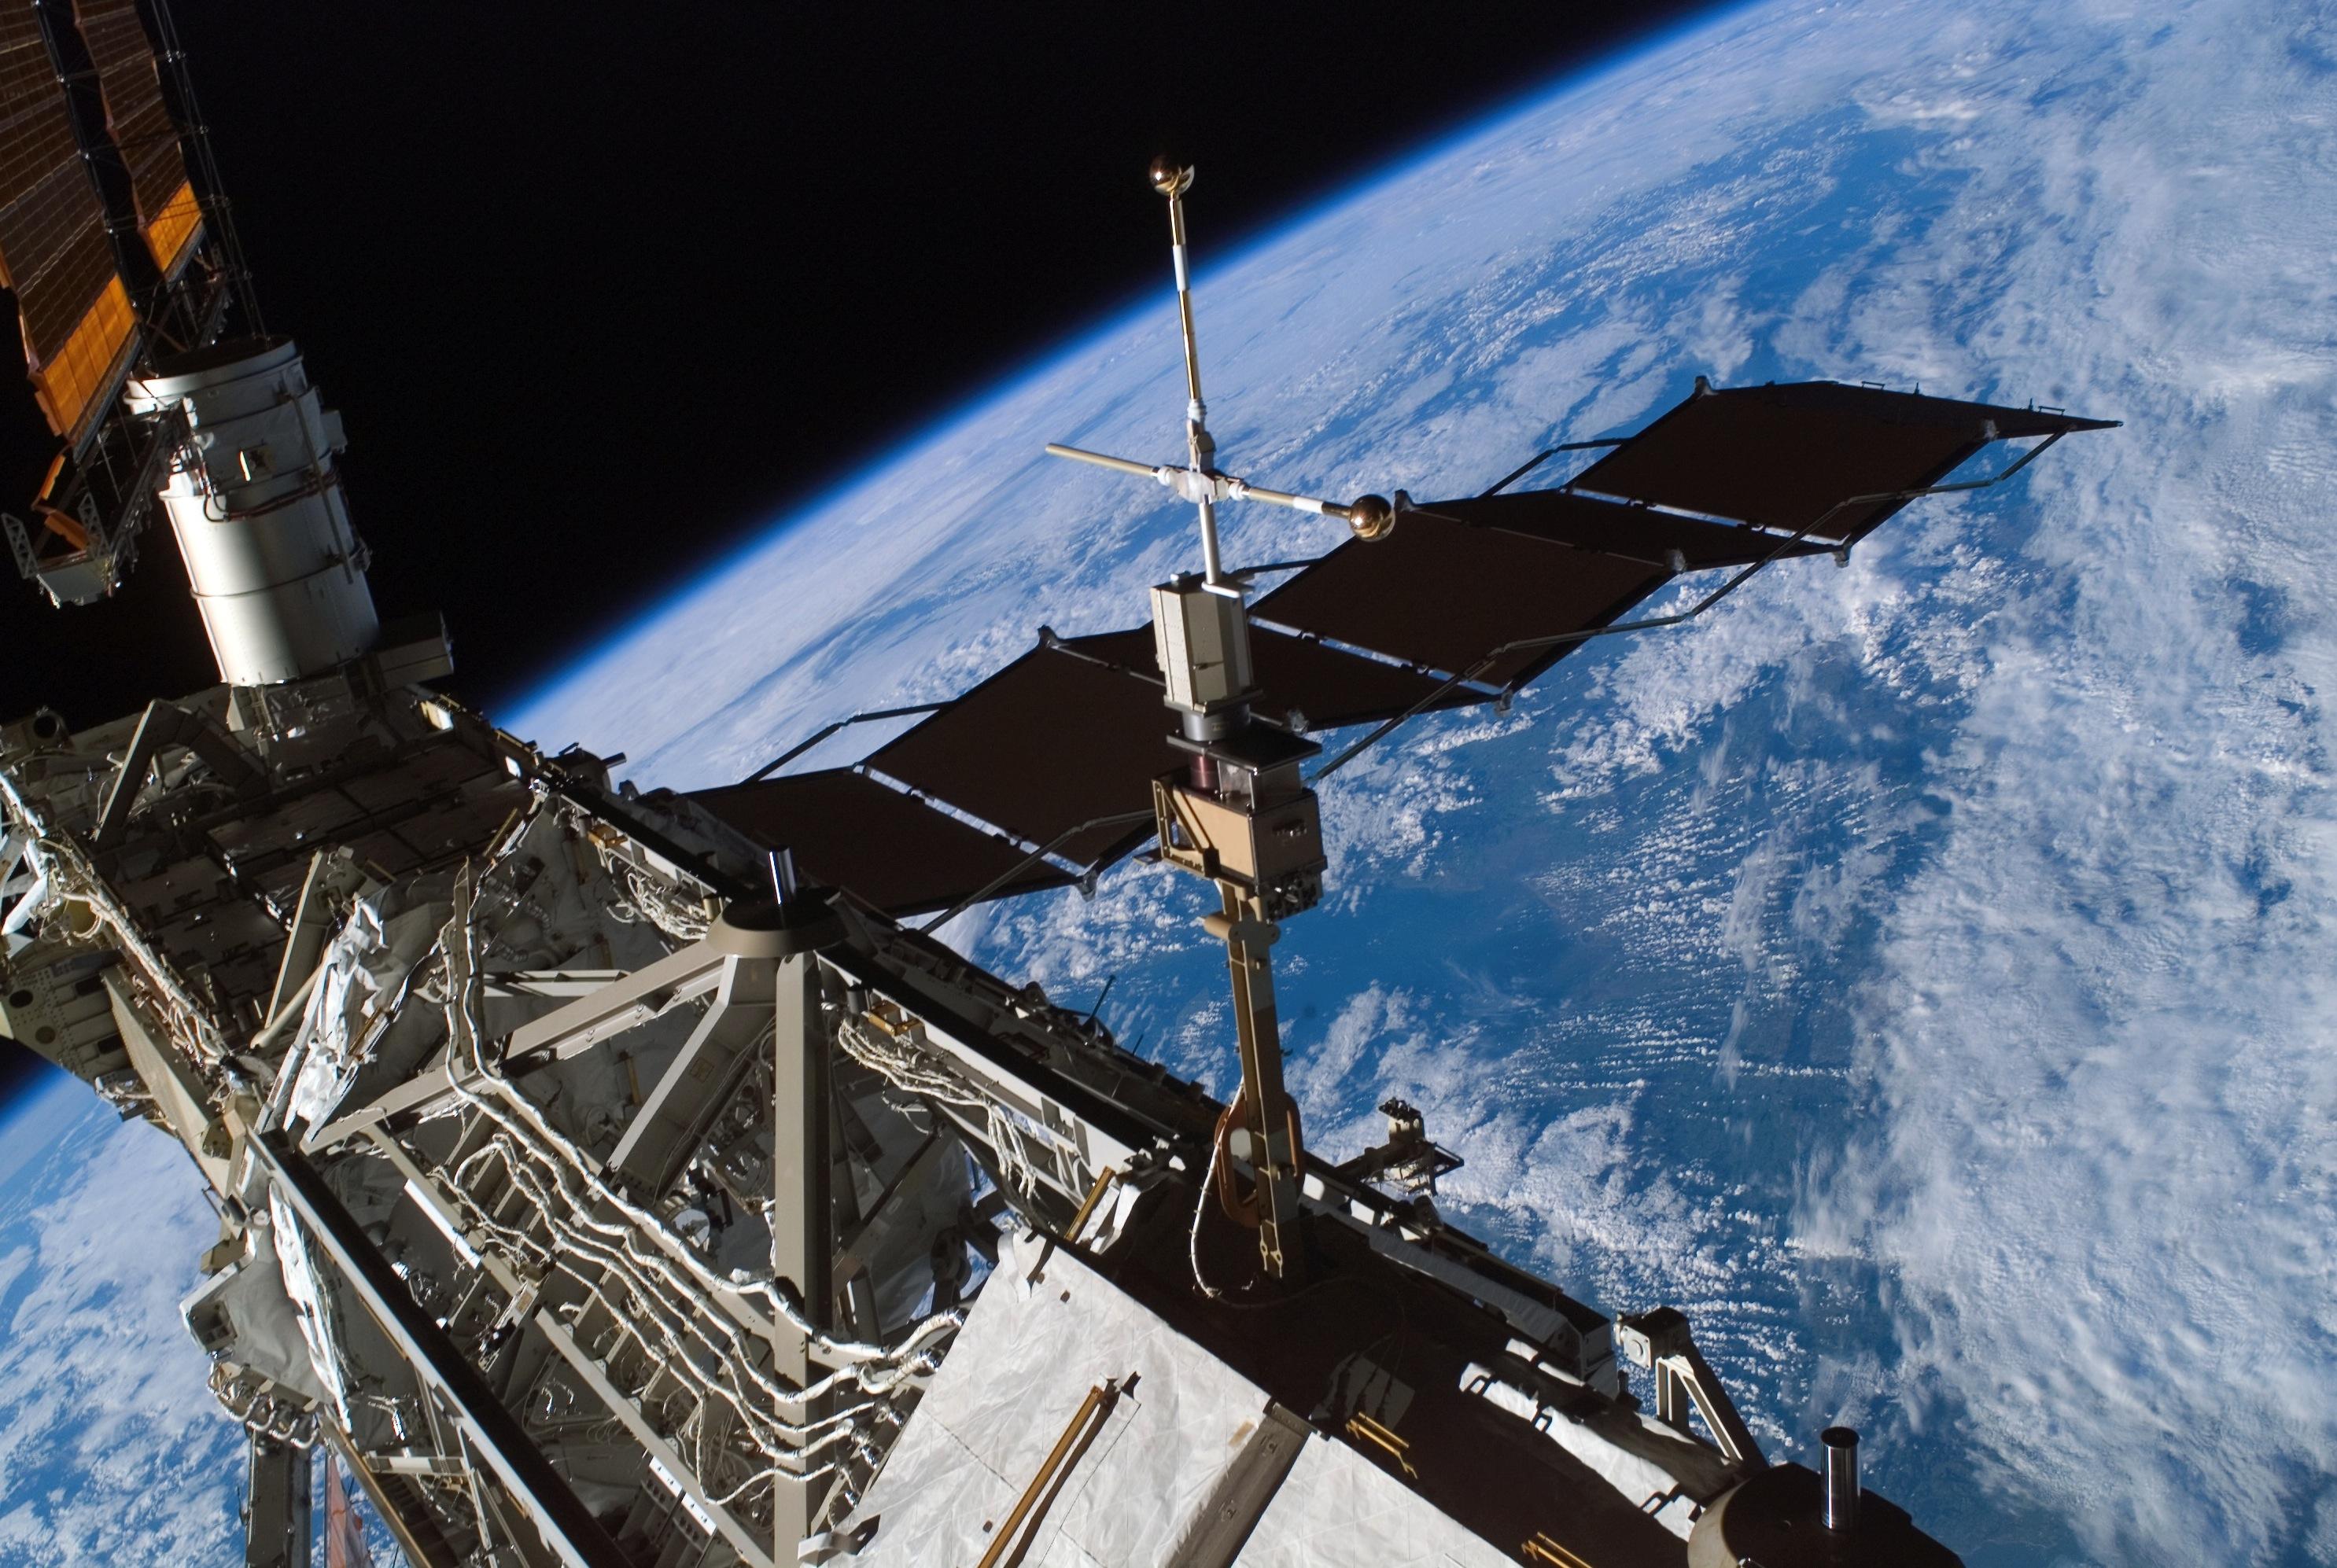 international space station nasa - HD2971×1994